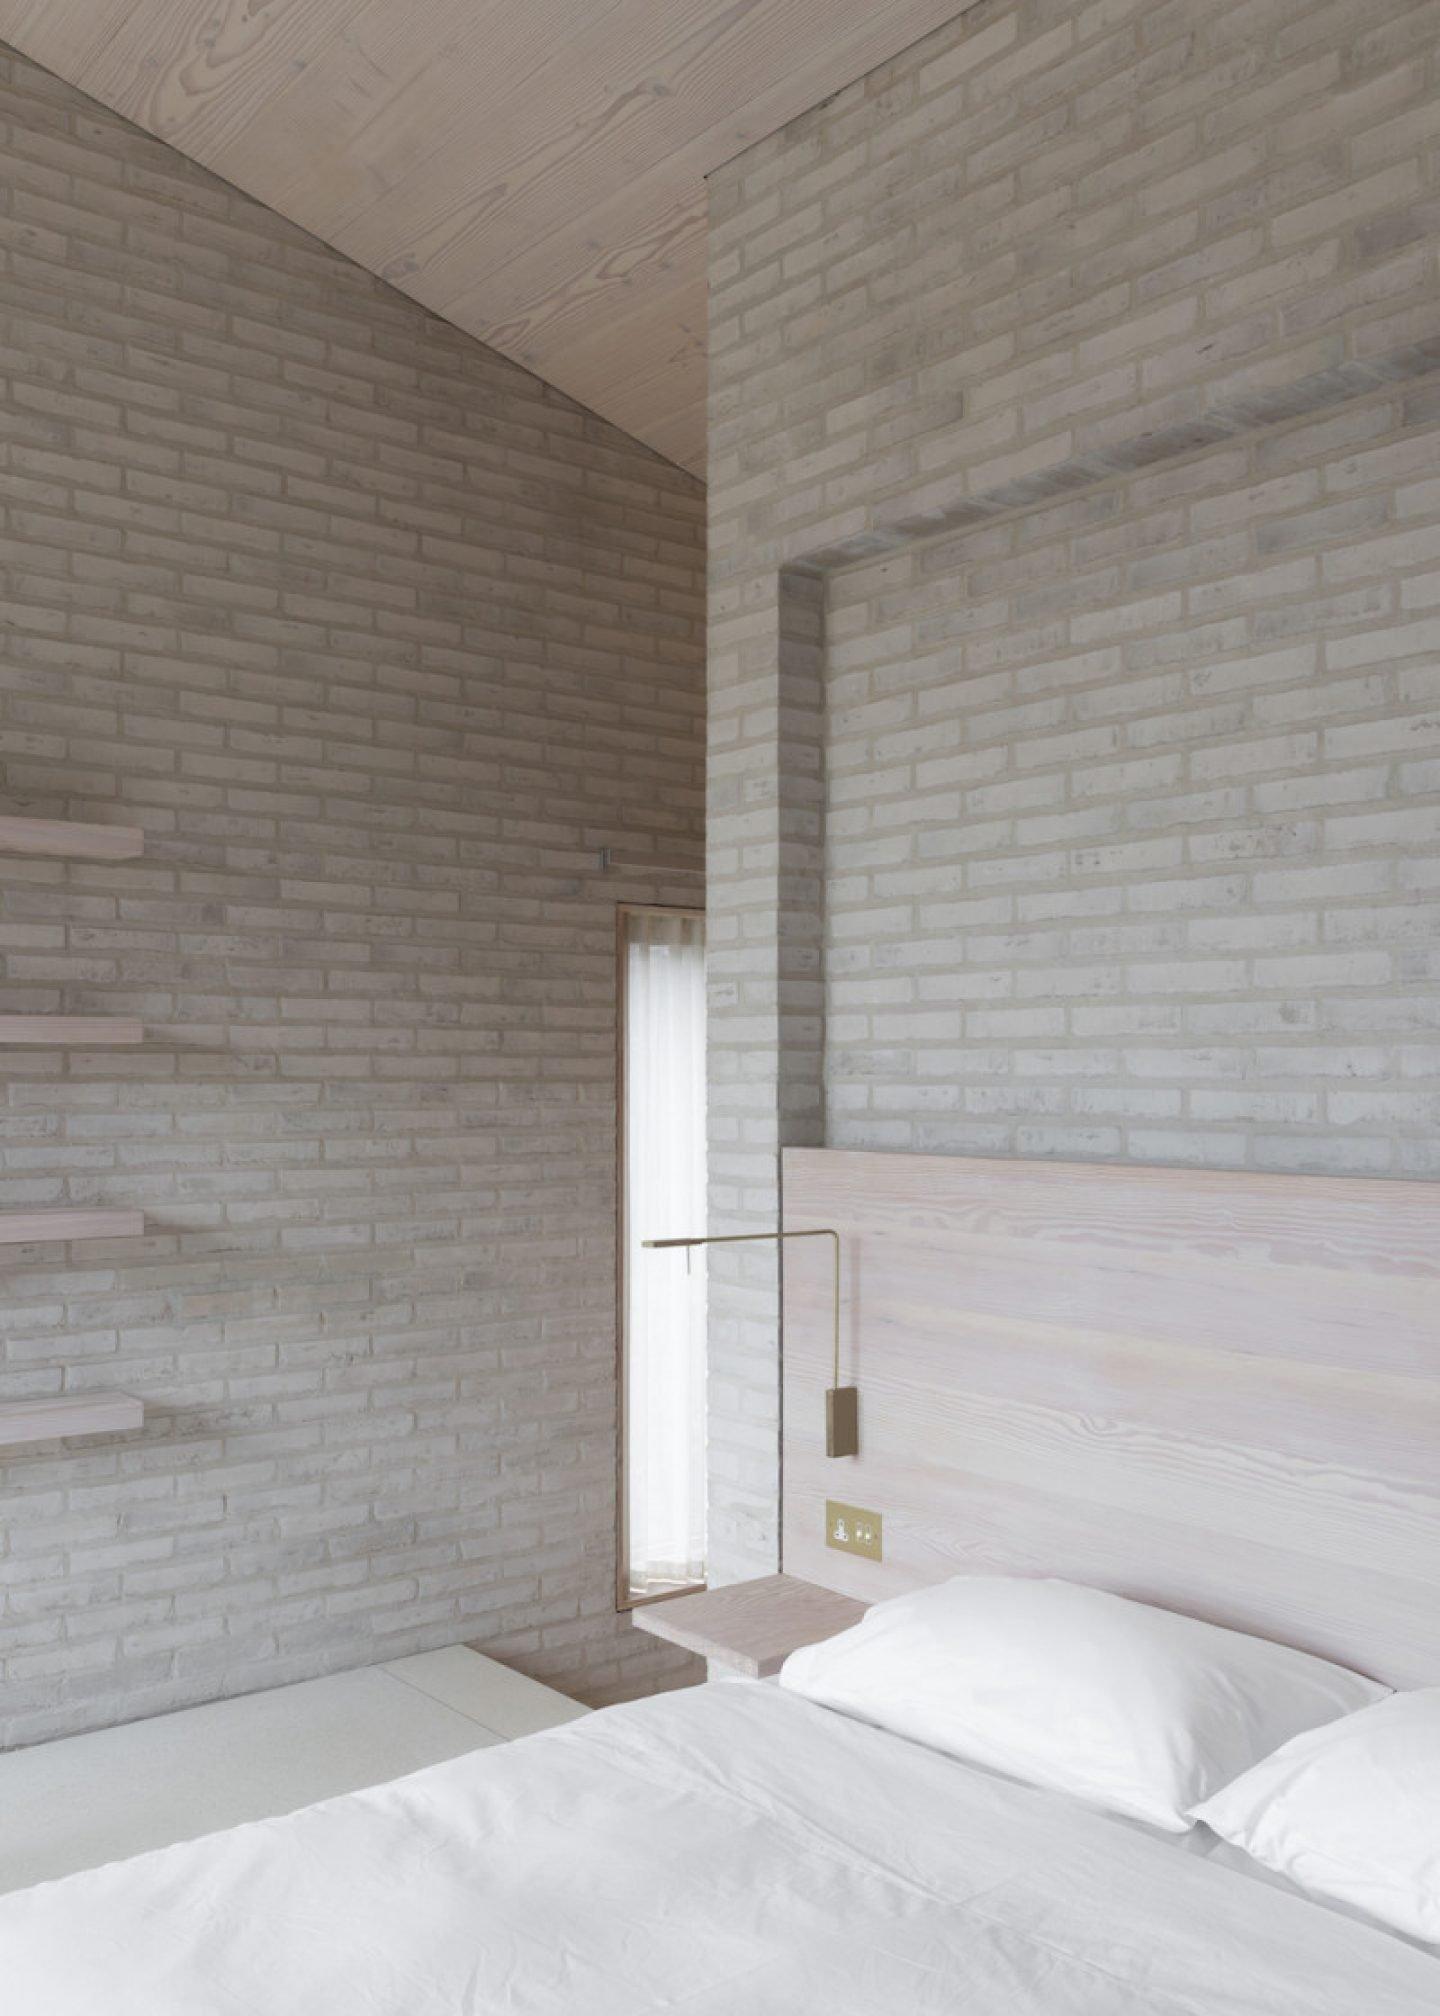 John_Pawson_Architecture__044